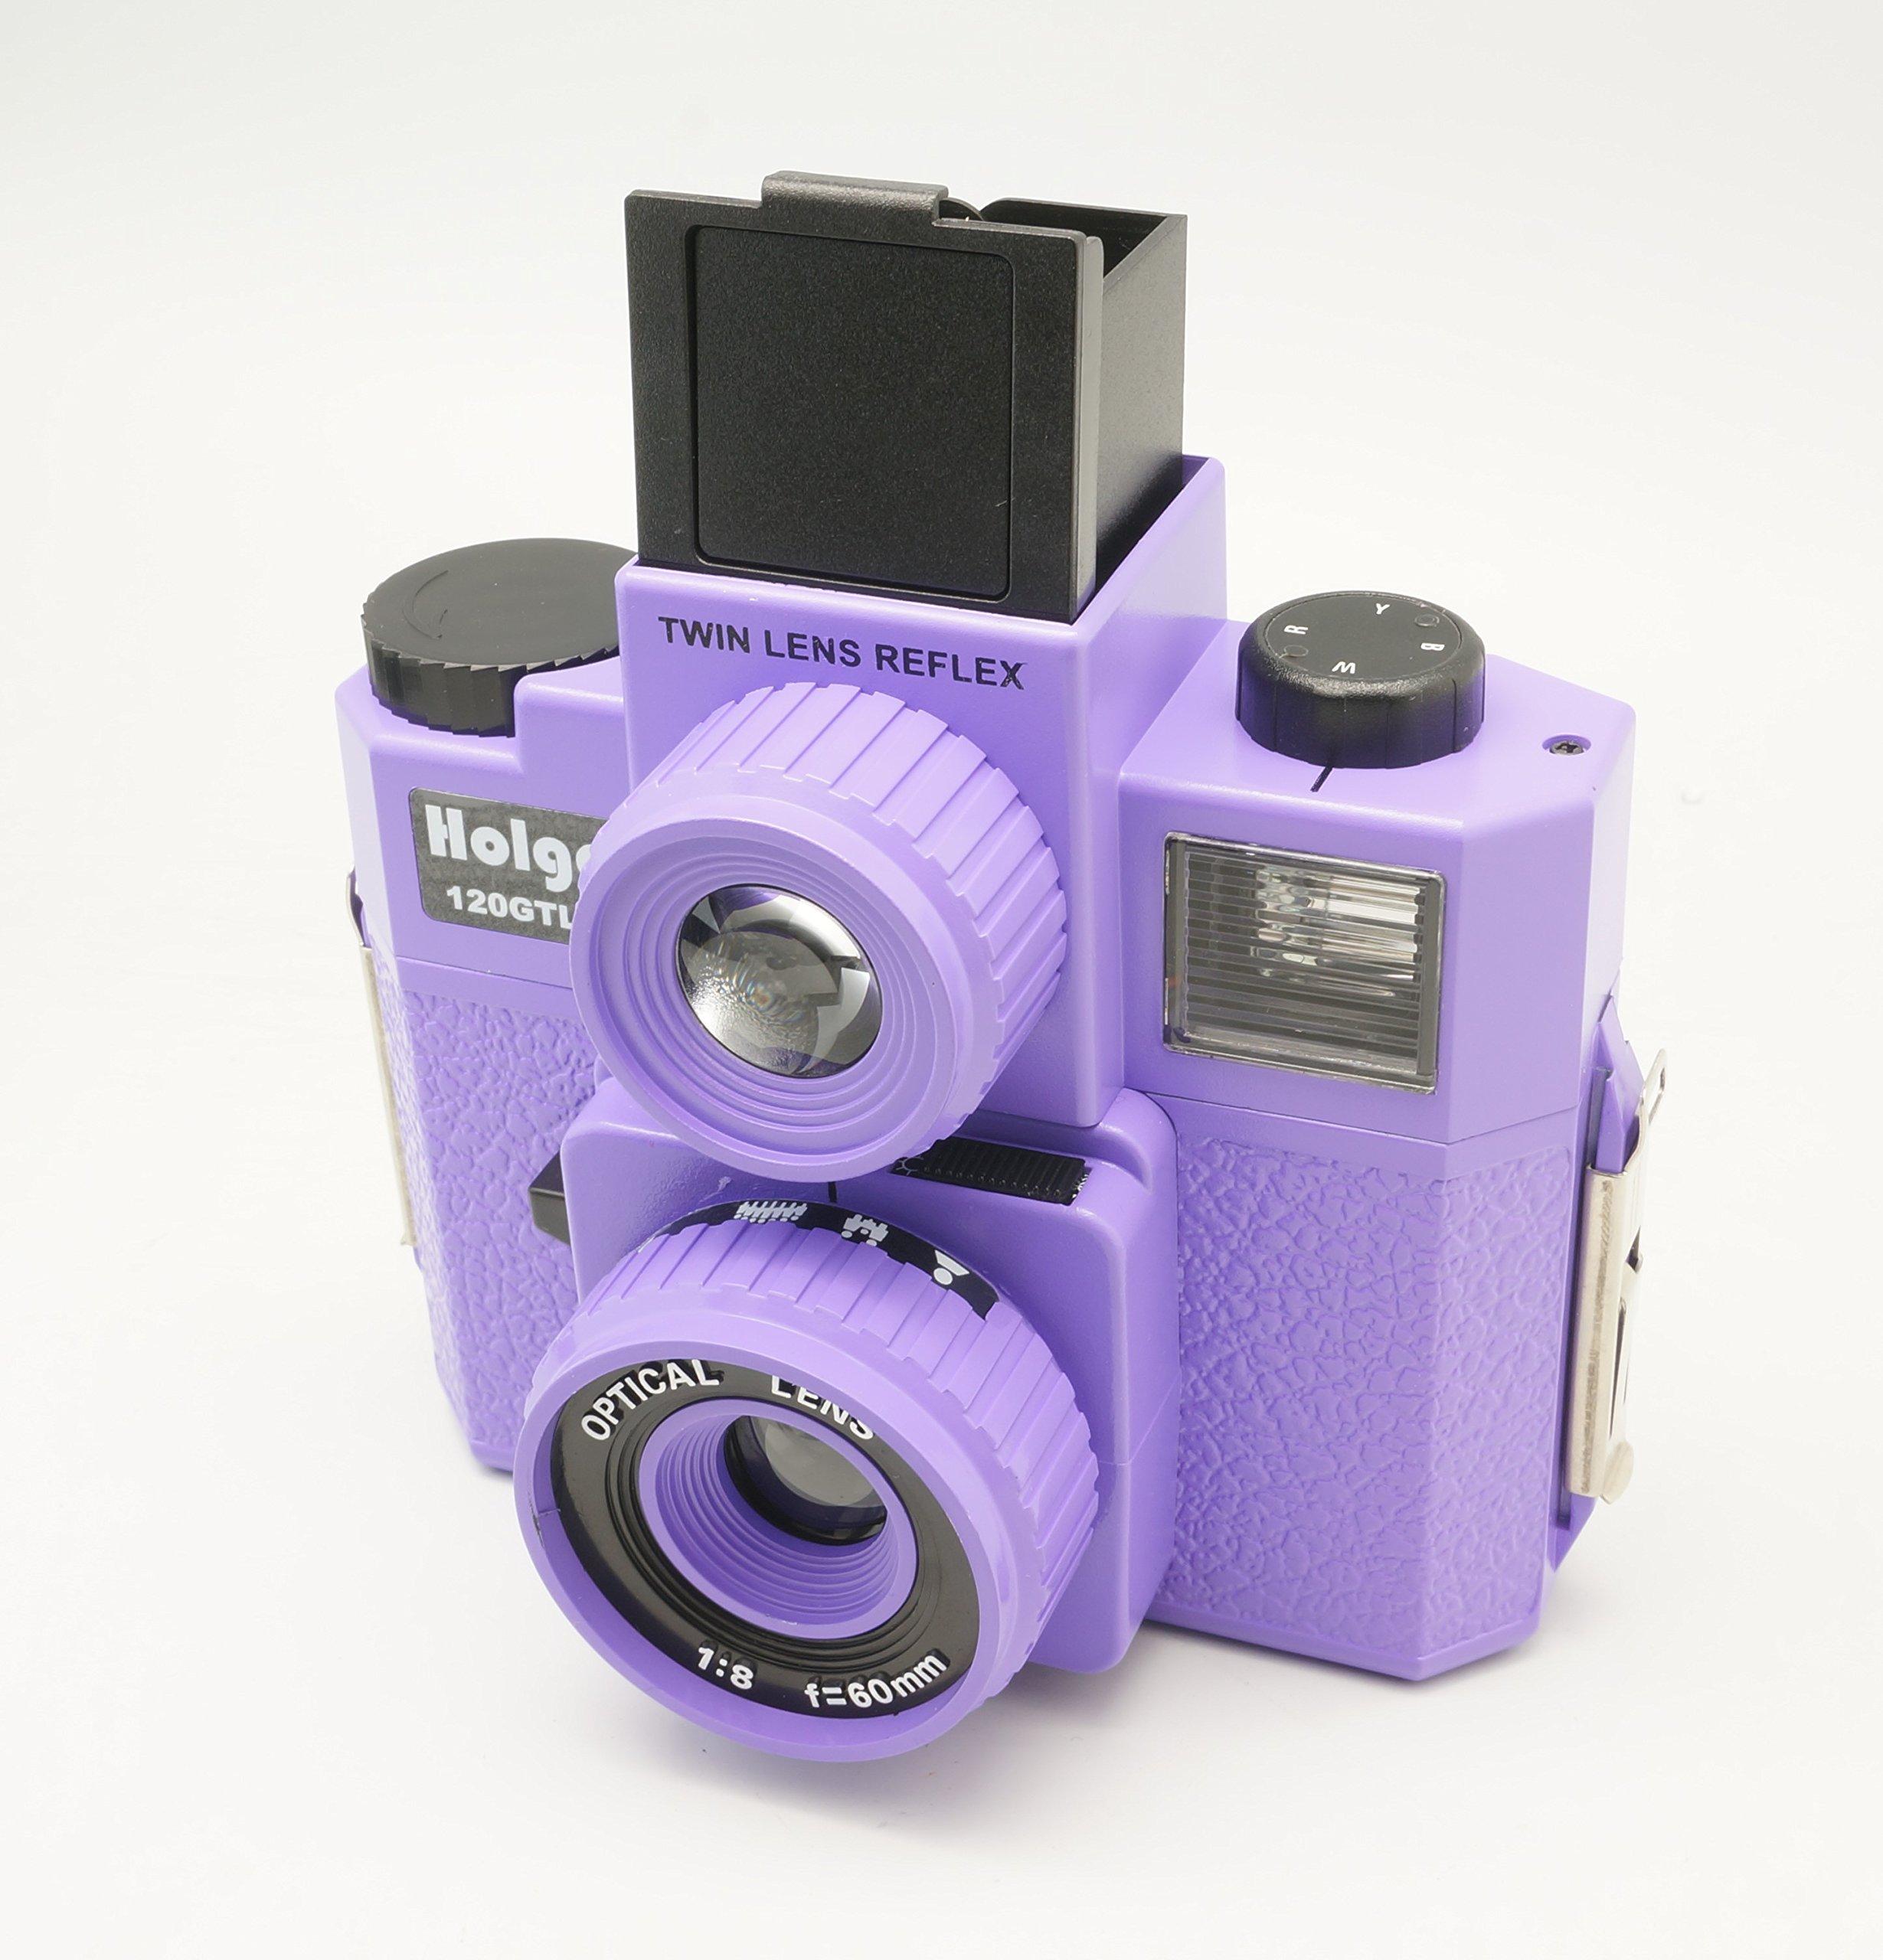 Holga 120GTLR Purple Medium Format 120 Film Camera Twin Lens Reflex (discontinued) by Holga